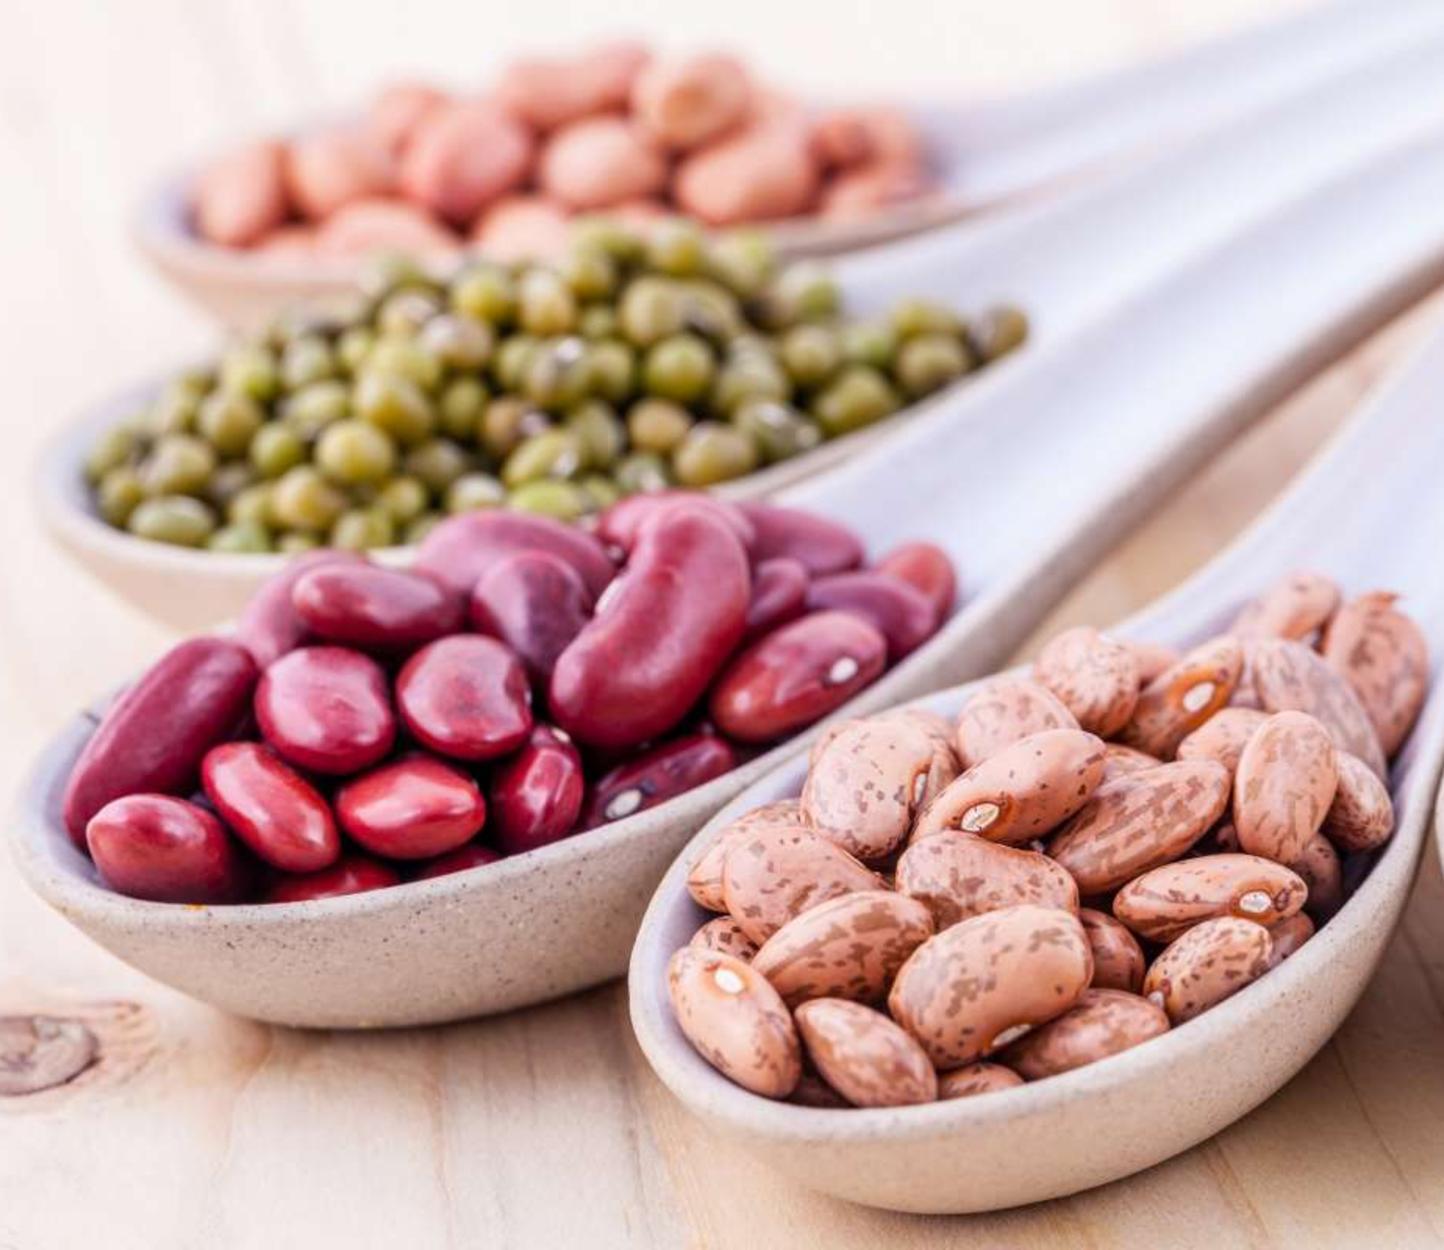 consumo de proteína